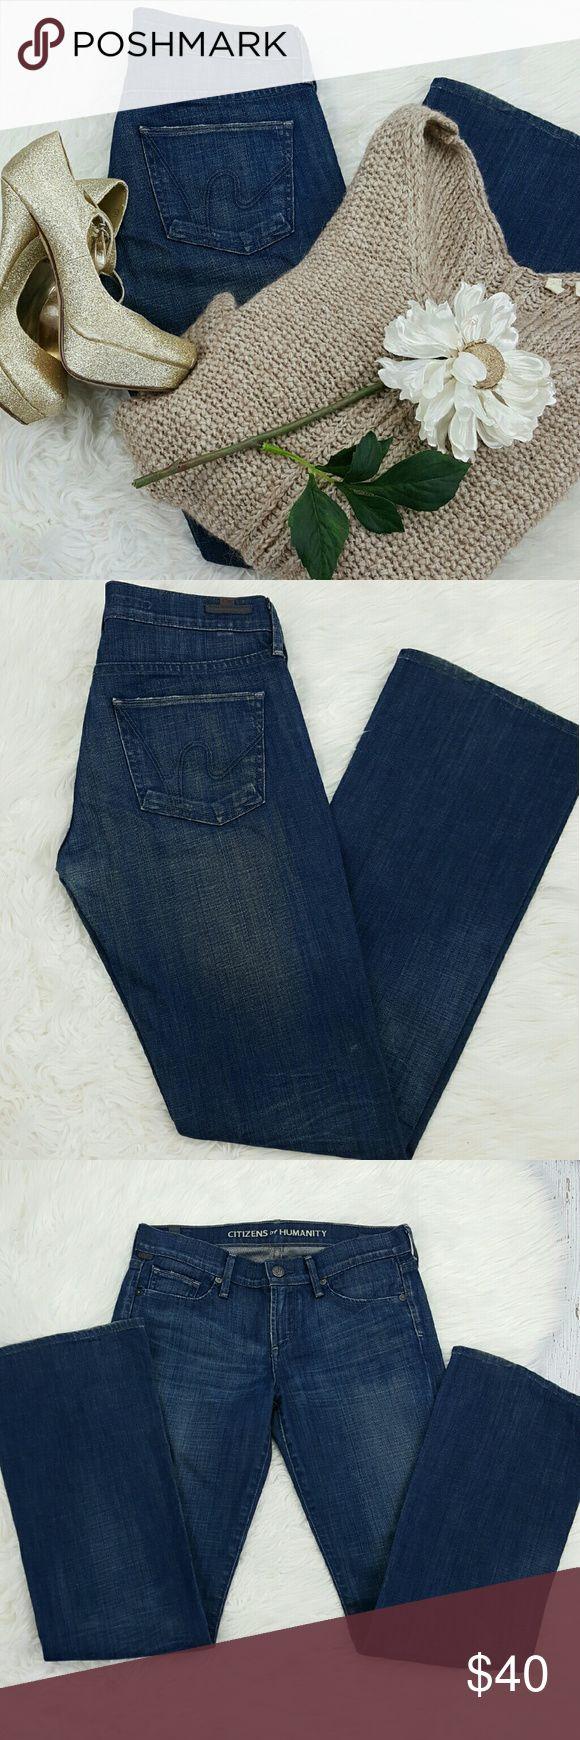 "💞SALE Citizens of Humanity Bootcut Premium Denim Awesome Citizens of Humanity Petite Bootcut Premium Denim 31"" Inseam 98% Cotton 2% Elastin Jeans Boot Cut"